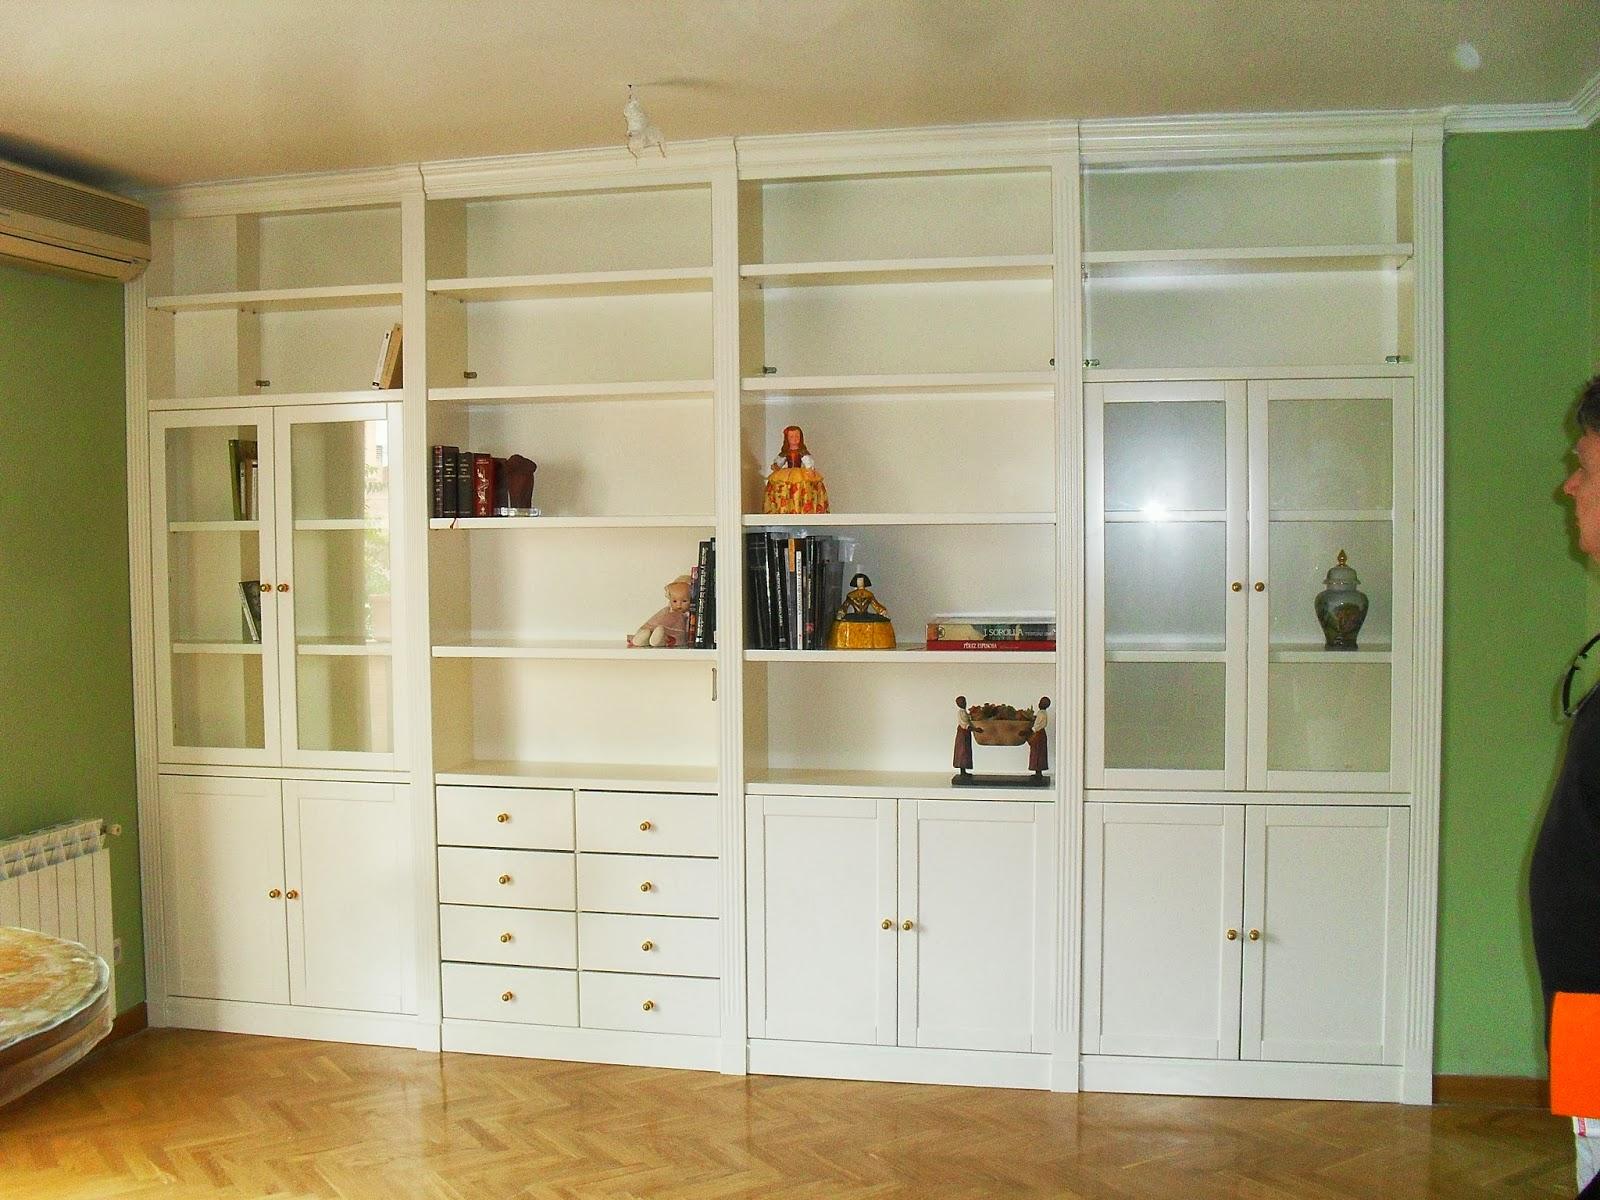 Librerias a medida madrid muebles librerias lacadas de calidad librerias a medida en madrid - Muebles a medida madrid ...